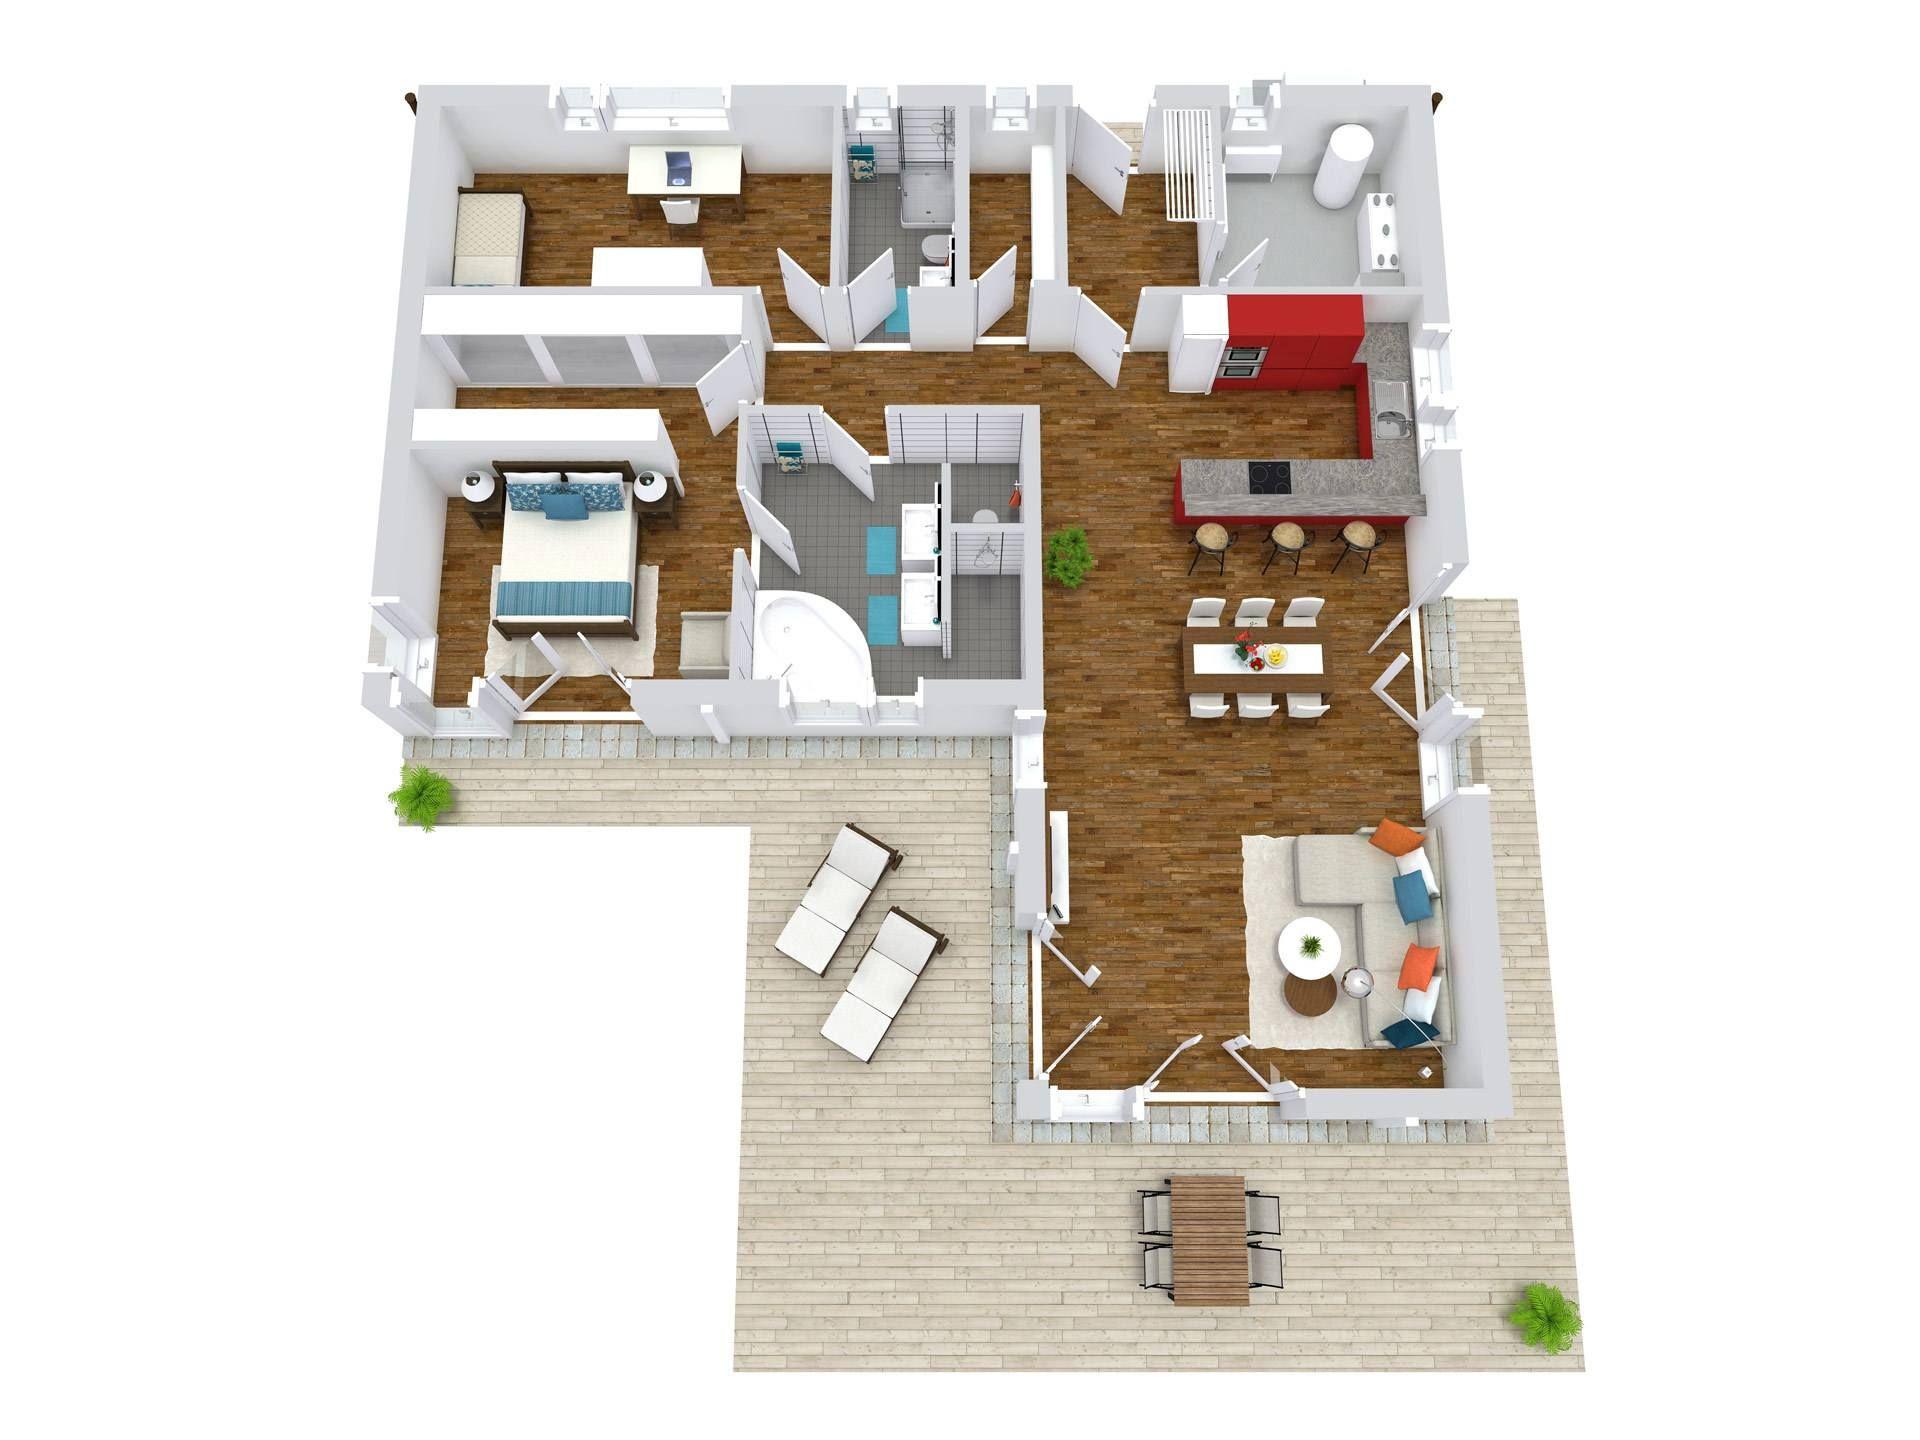 bungalow lessingstraße 129 | grundrisse | bungalow, haus und grundriss